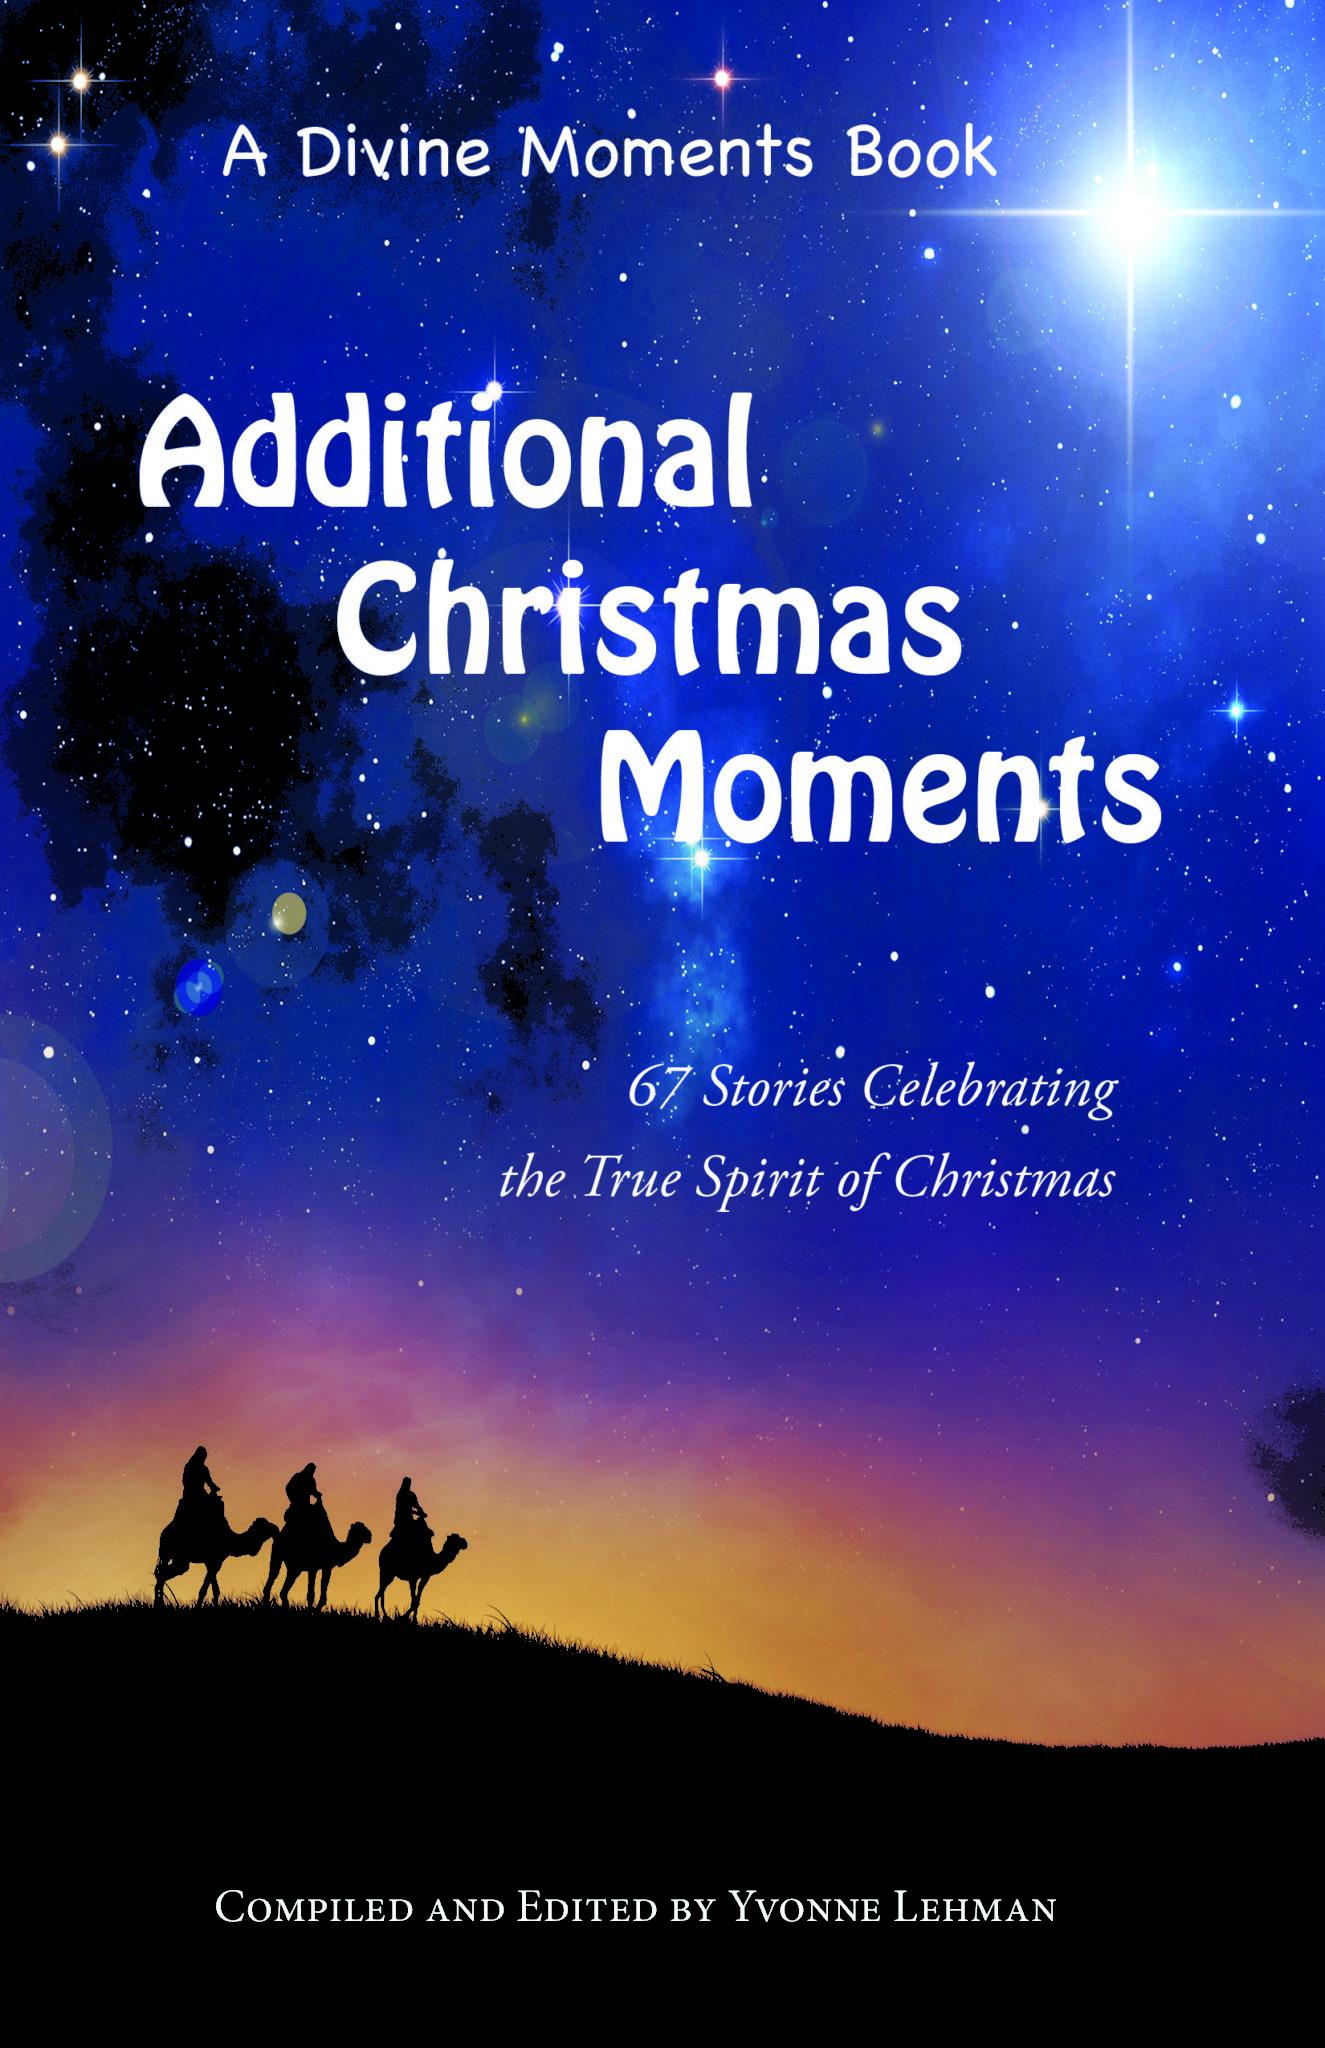 Heartwarming Christmas Stories for the Season